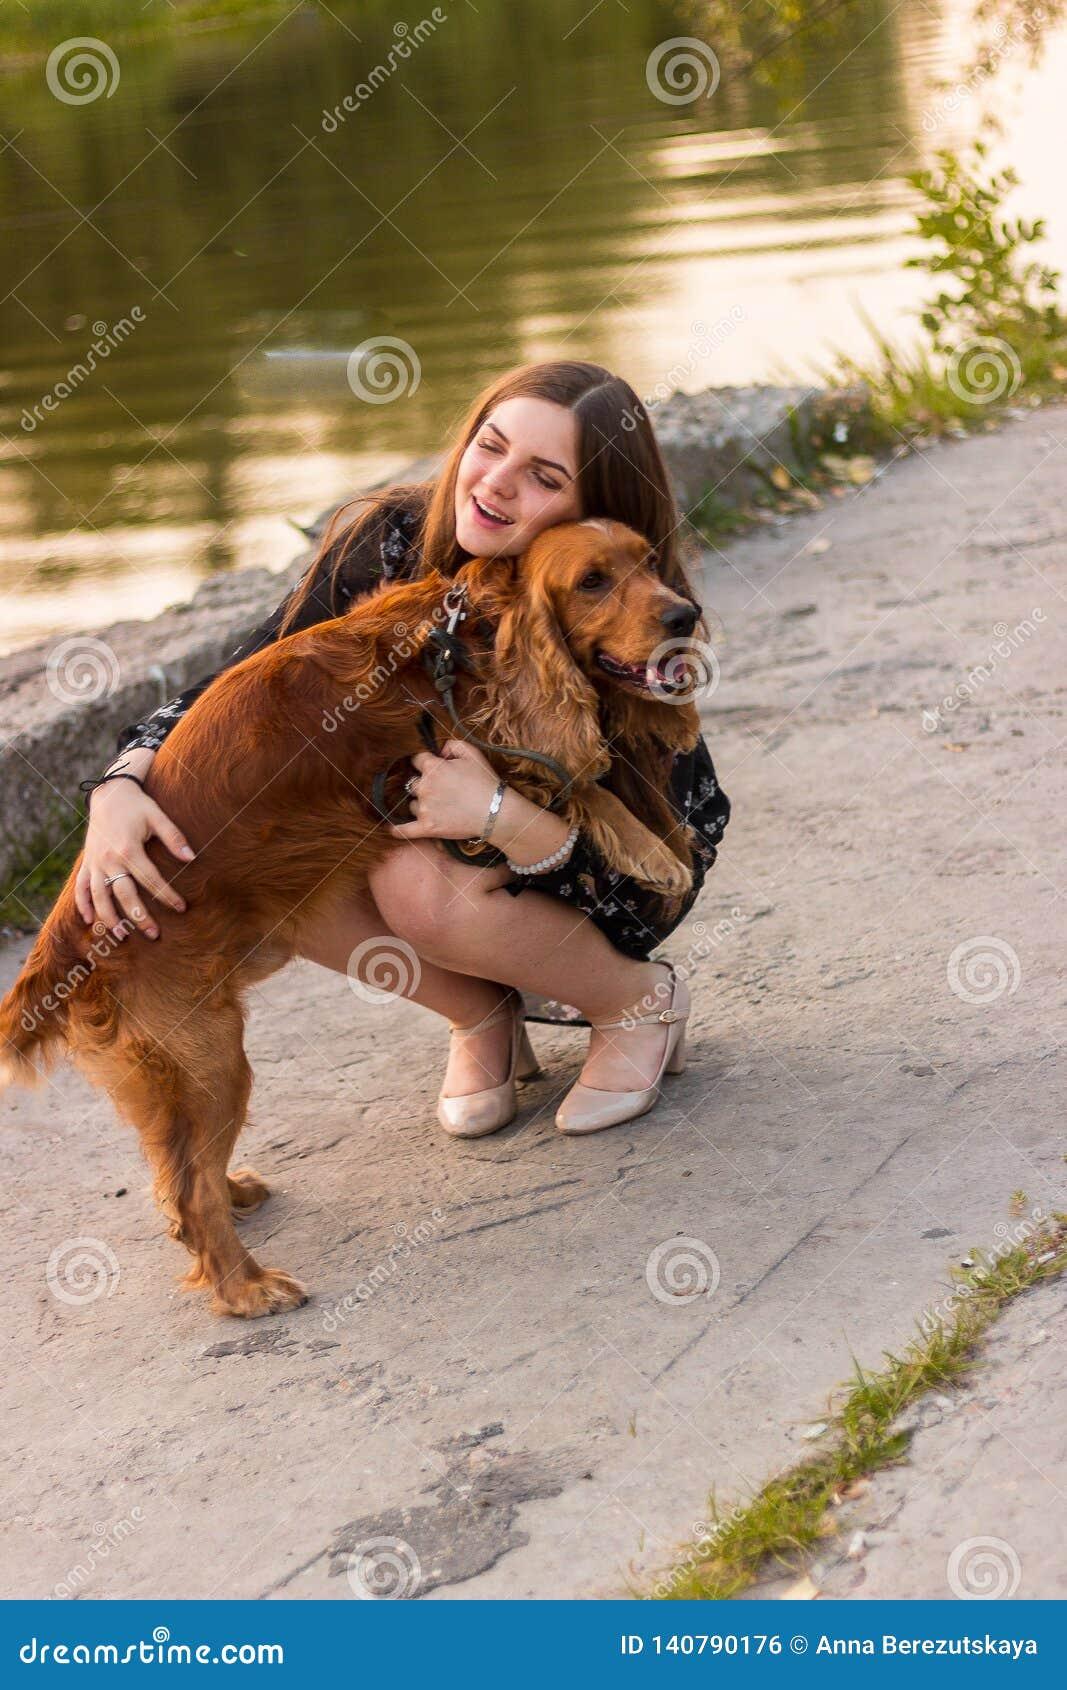 Girl hugging dog pet cute adorable red dog friendly closeup closing eyes funny animals